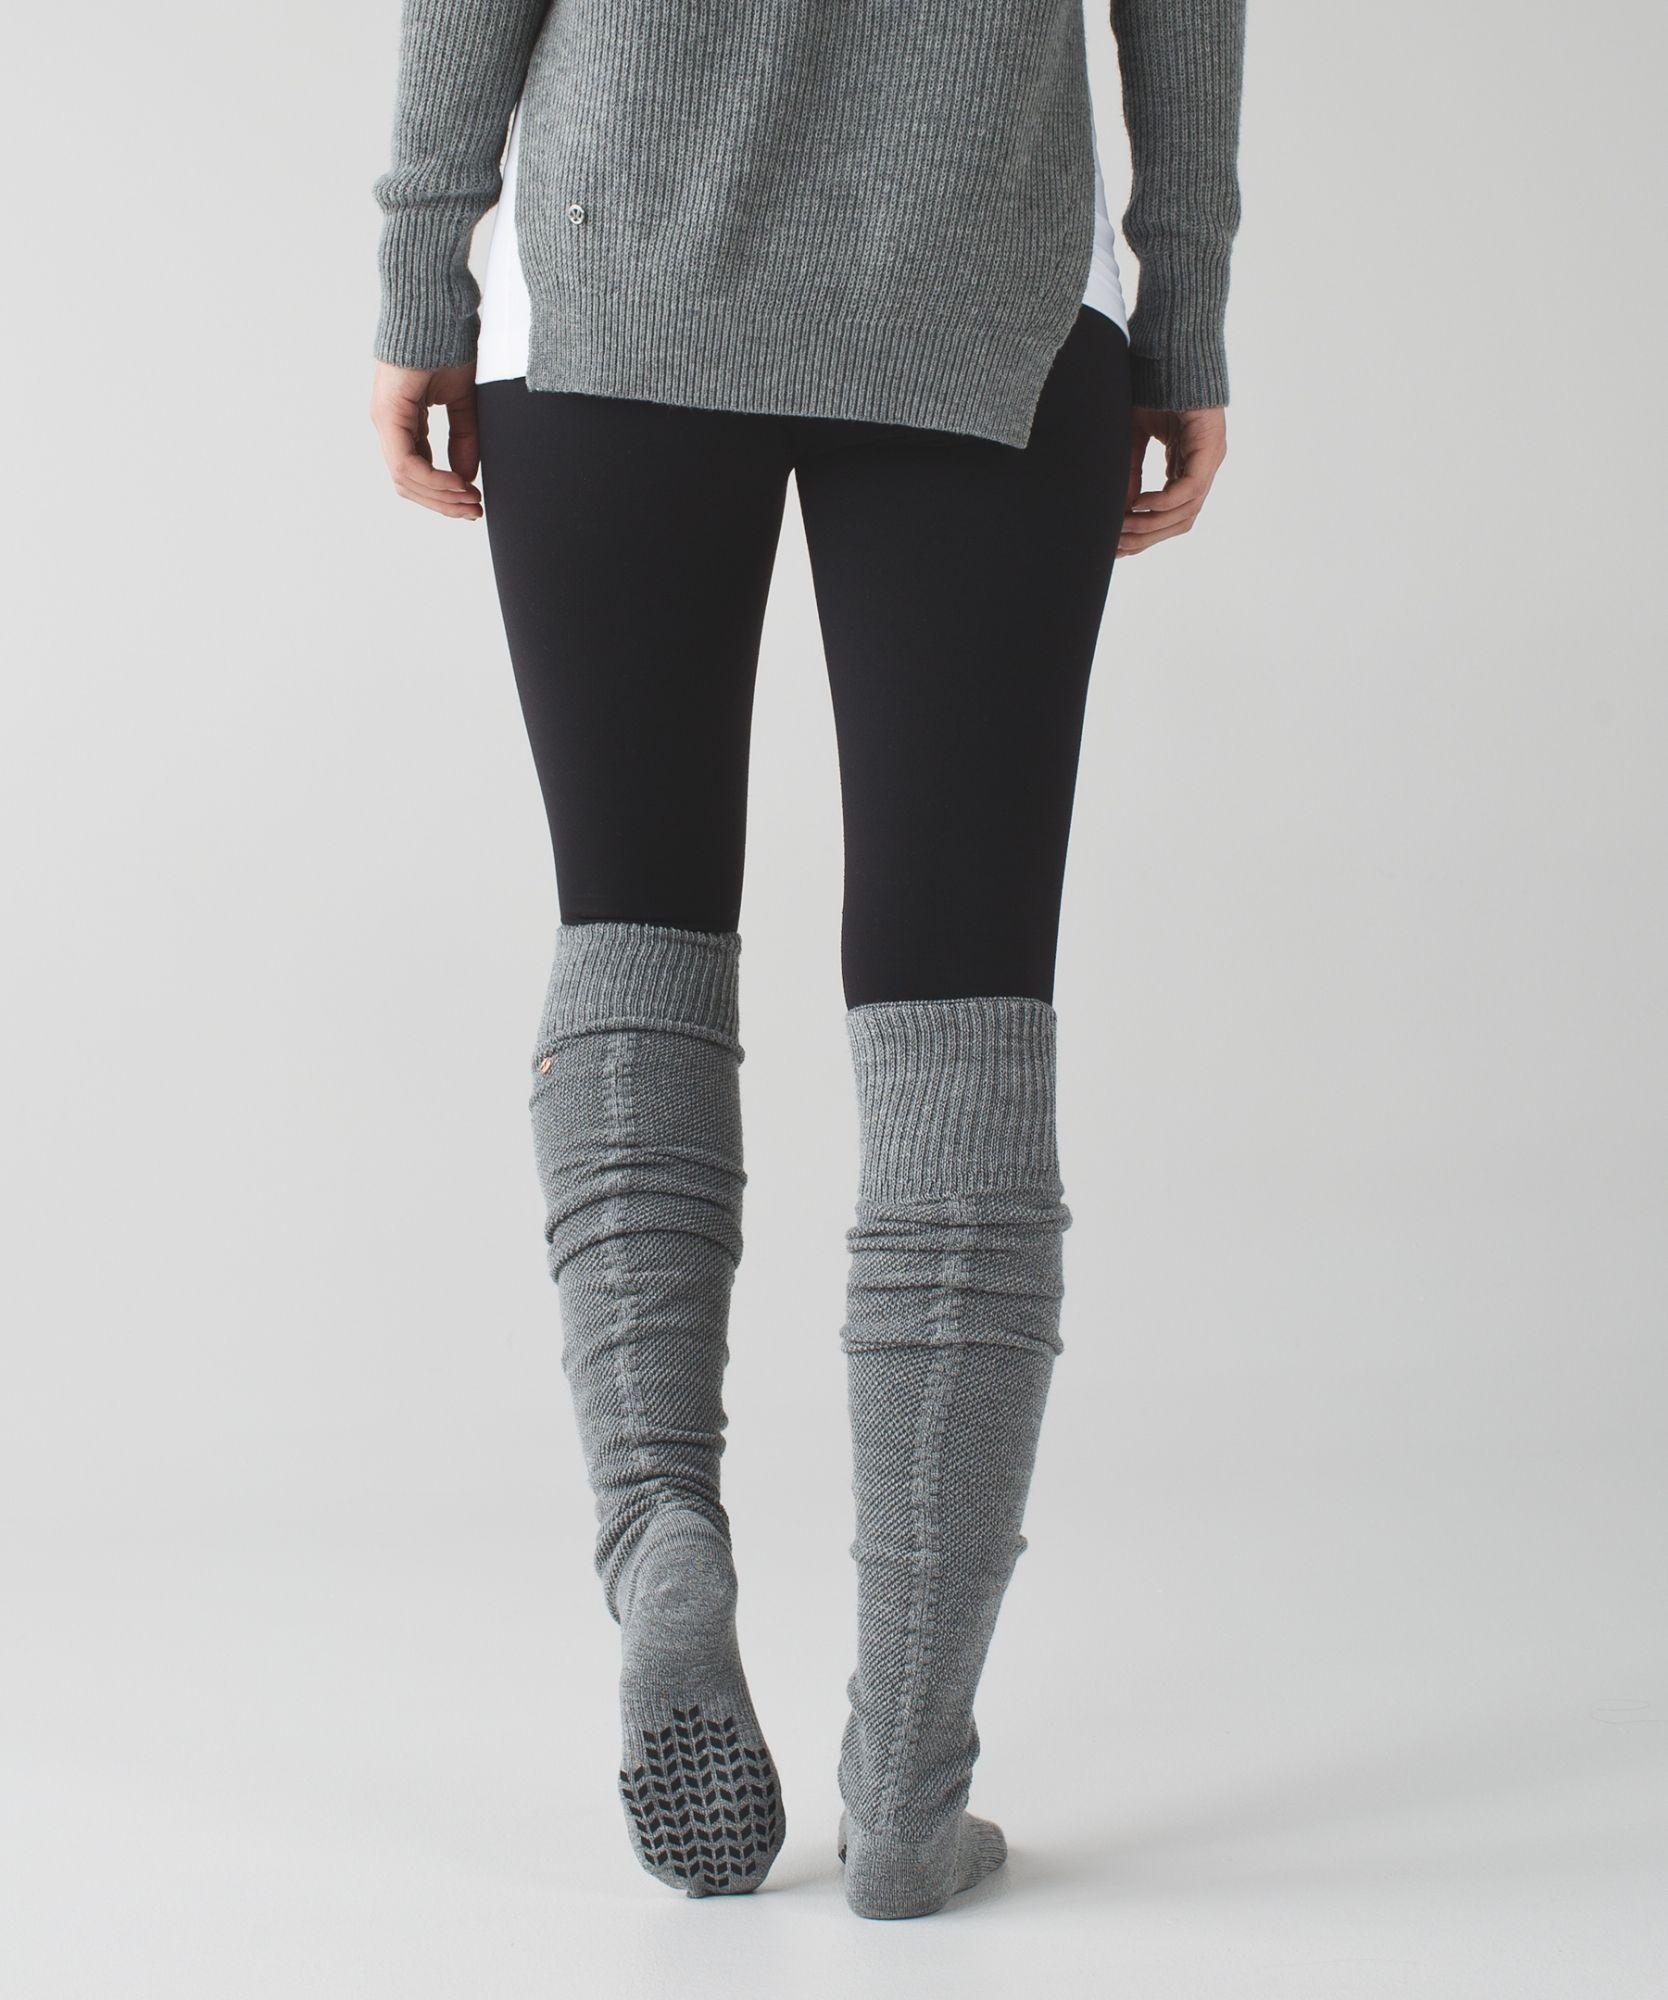 Layer these cozy socks over tights to keep warm in Savasana oron